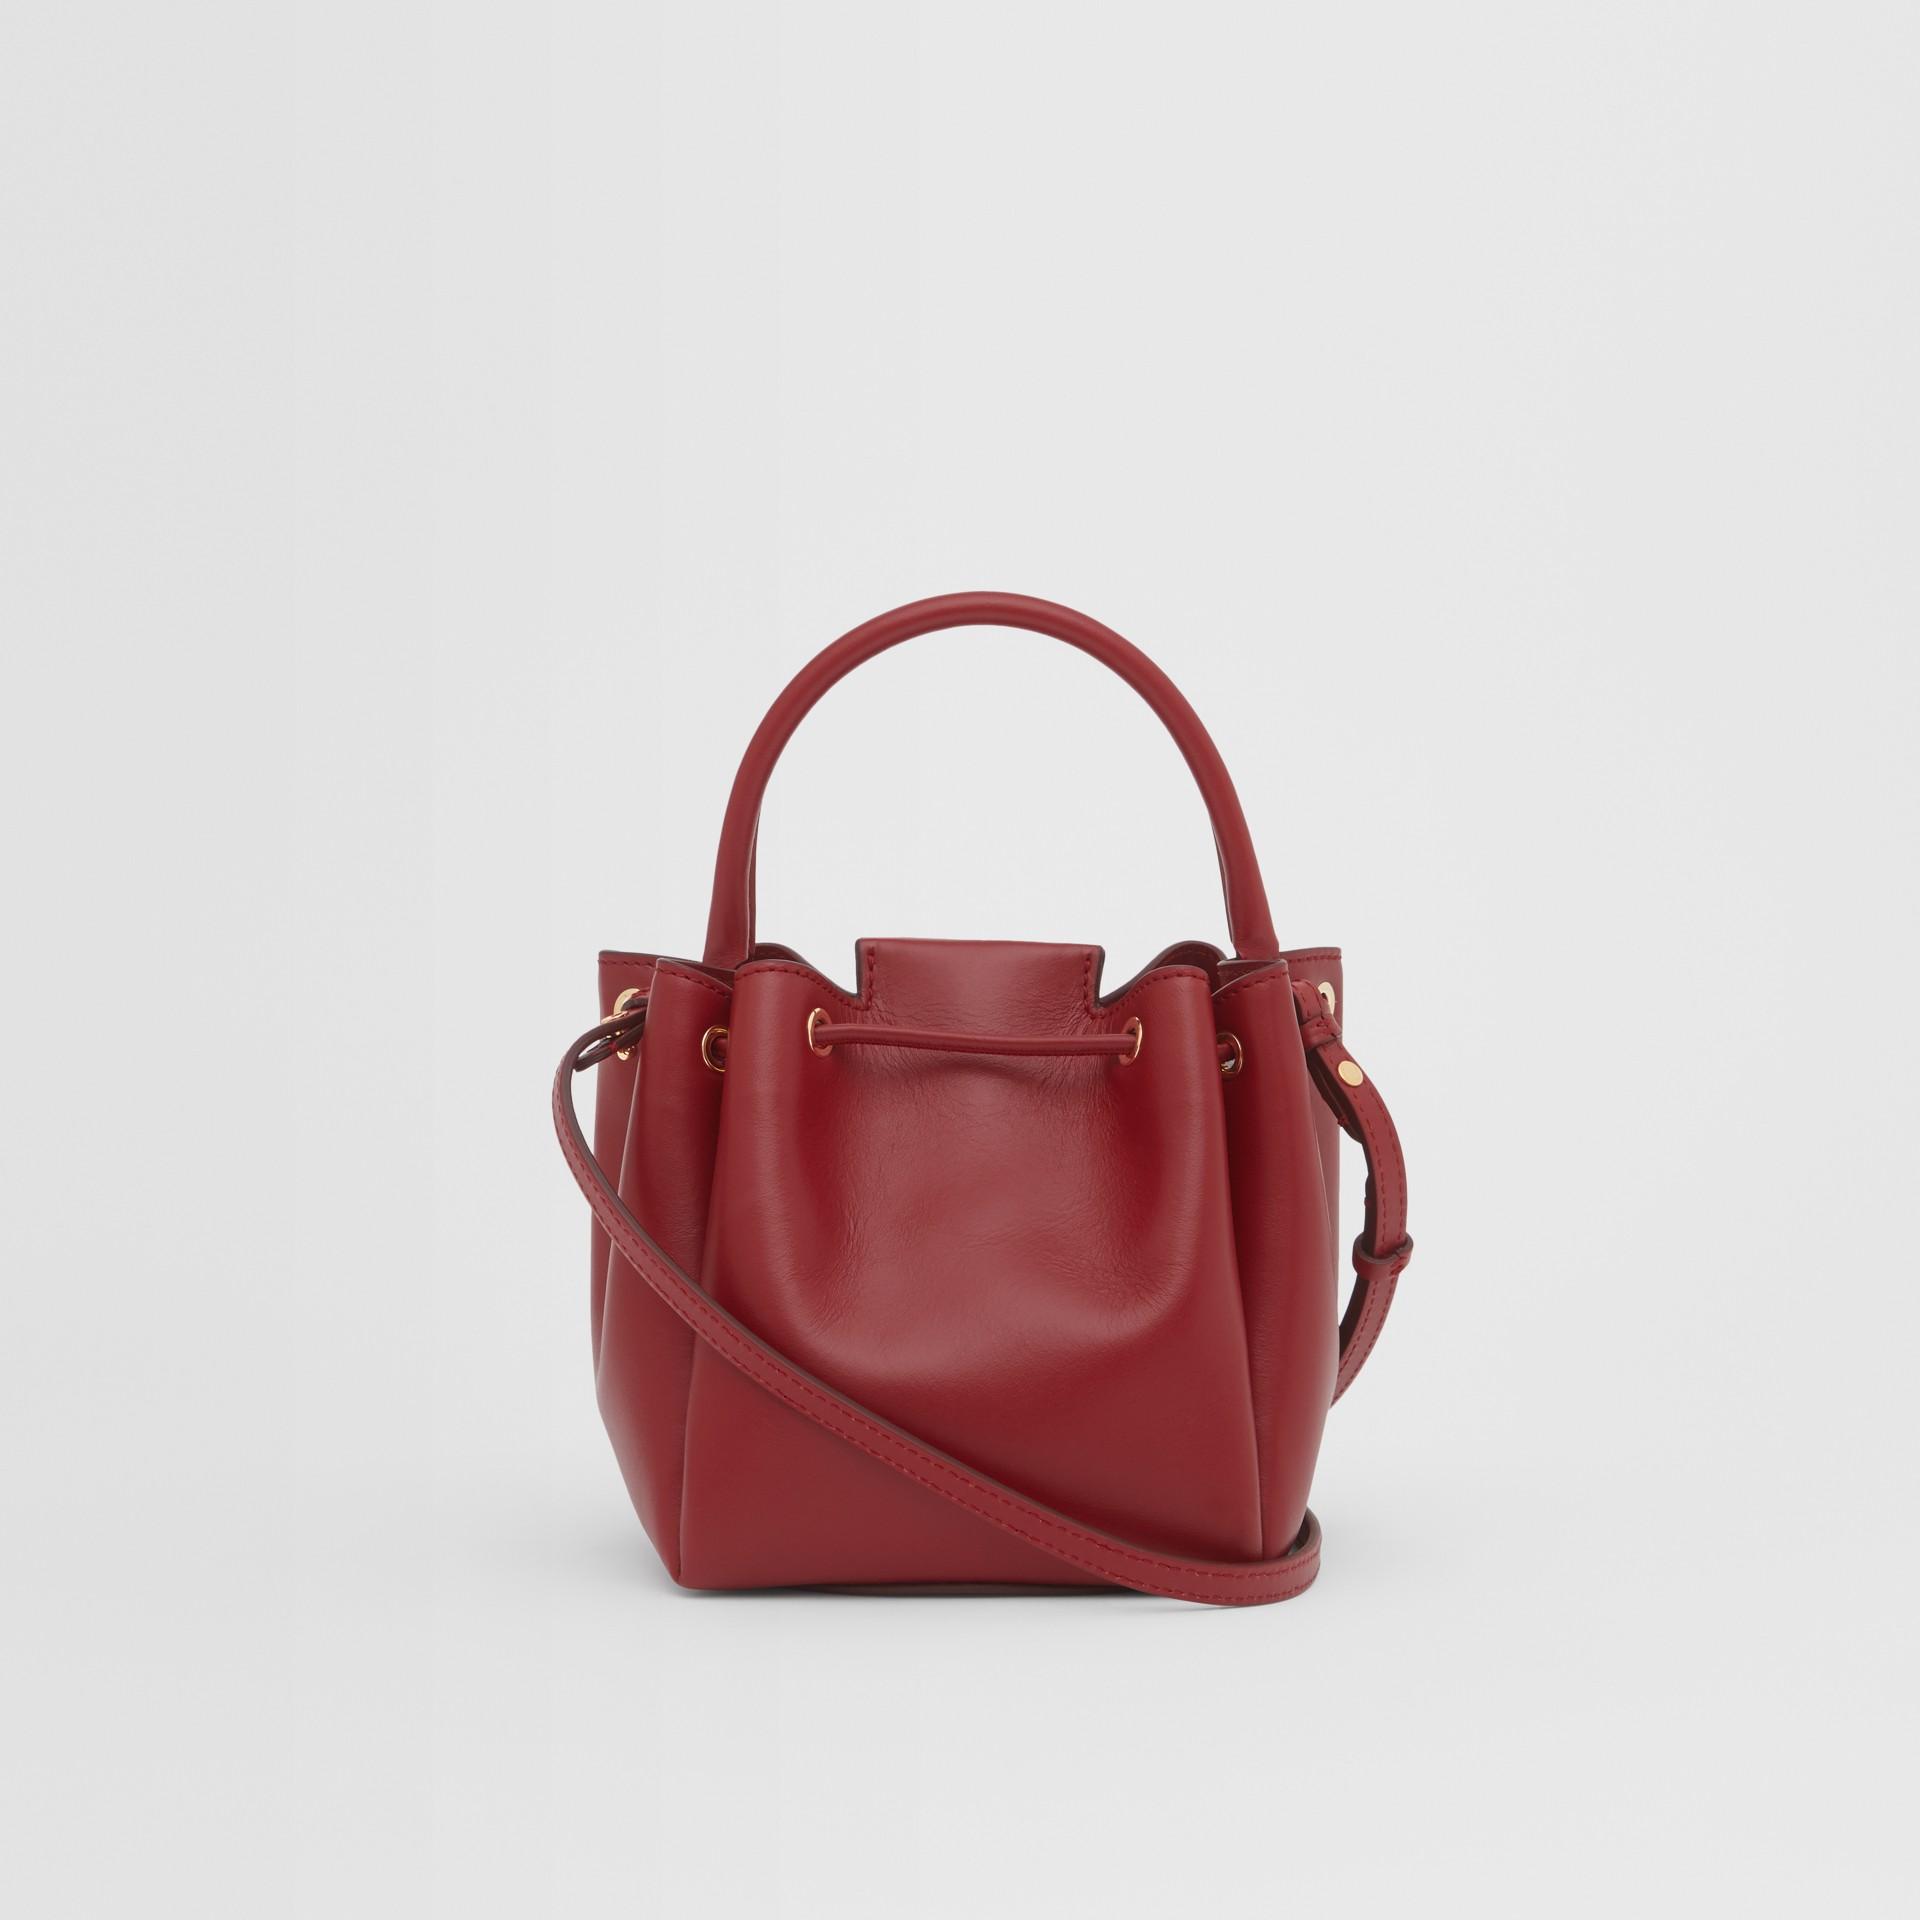 Monogram Motif Leather Bucket Bag in Dark Carmine - Women | Burberry United States - gallery image 5